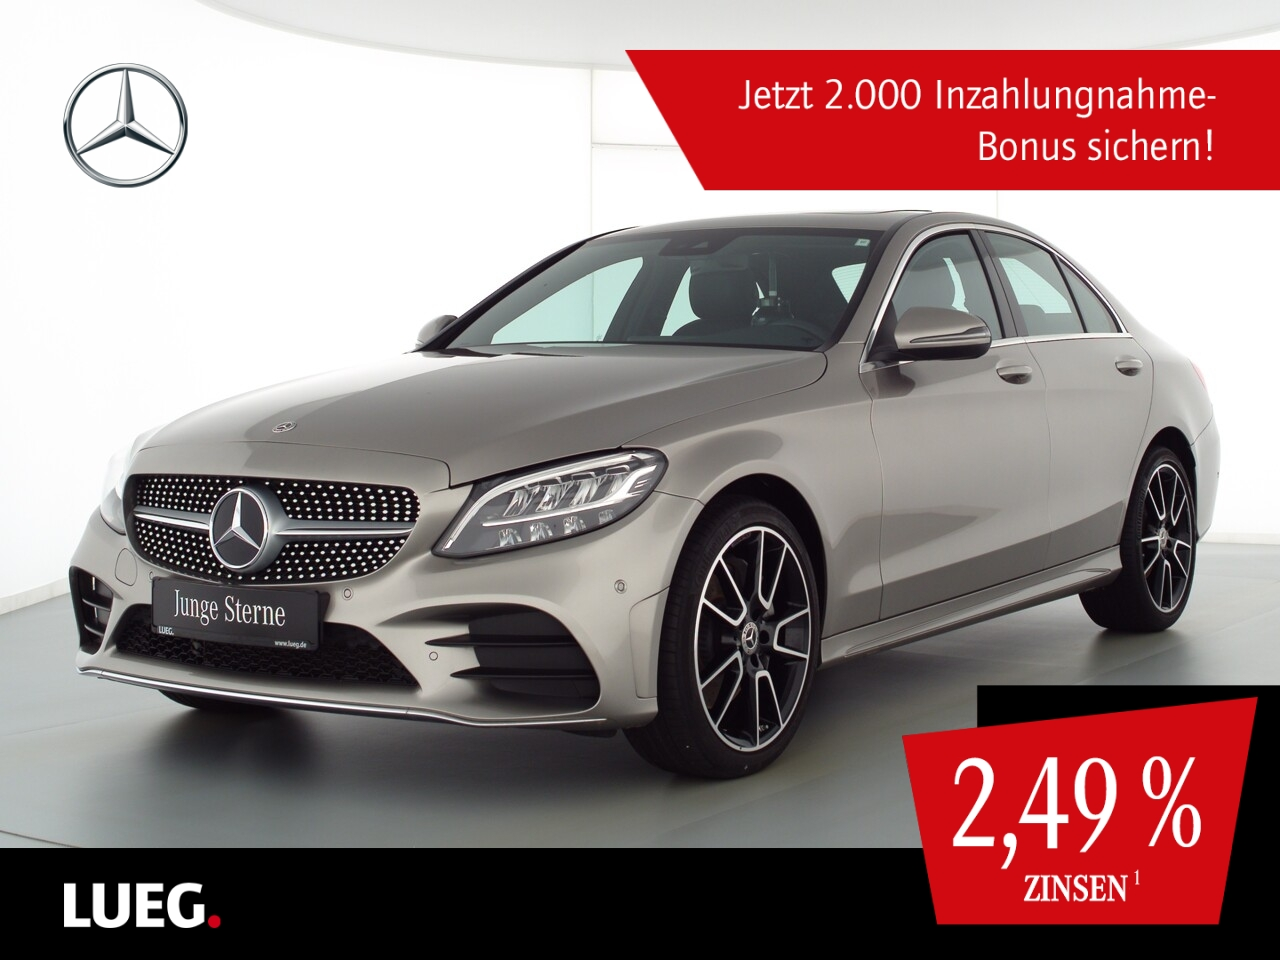 Mercedes-Benz C 400 4M AMG+COM+SHD+LED-HP+19AMG+CarP+ParkA+RFK, Jahr 2019, Benzin